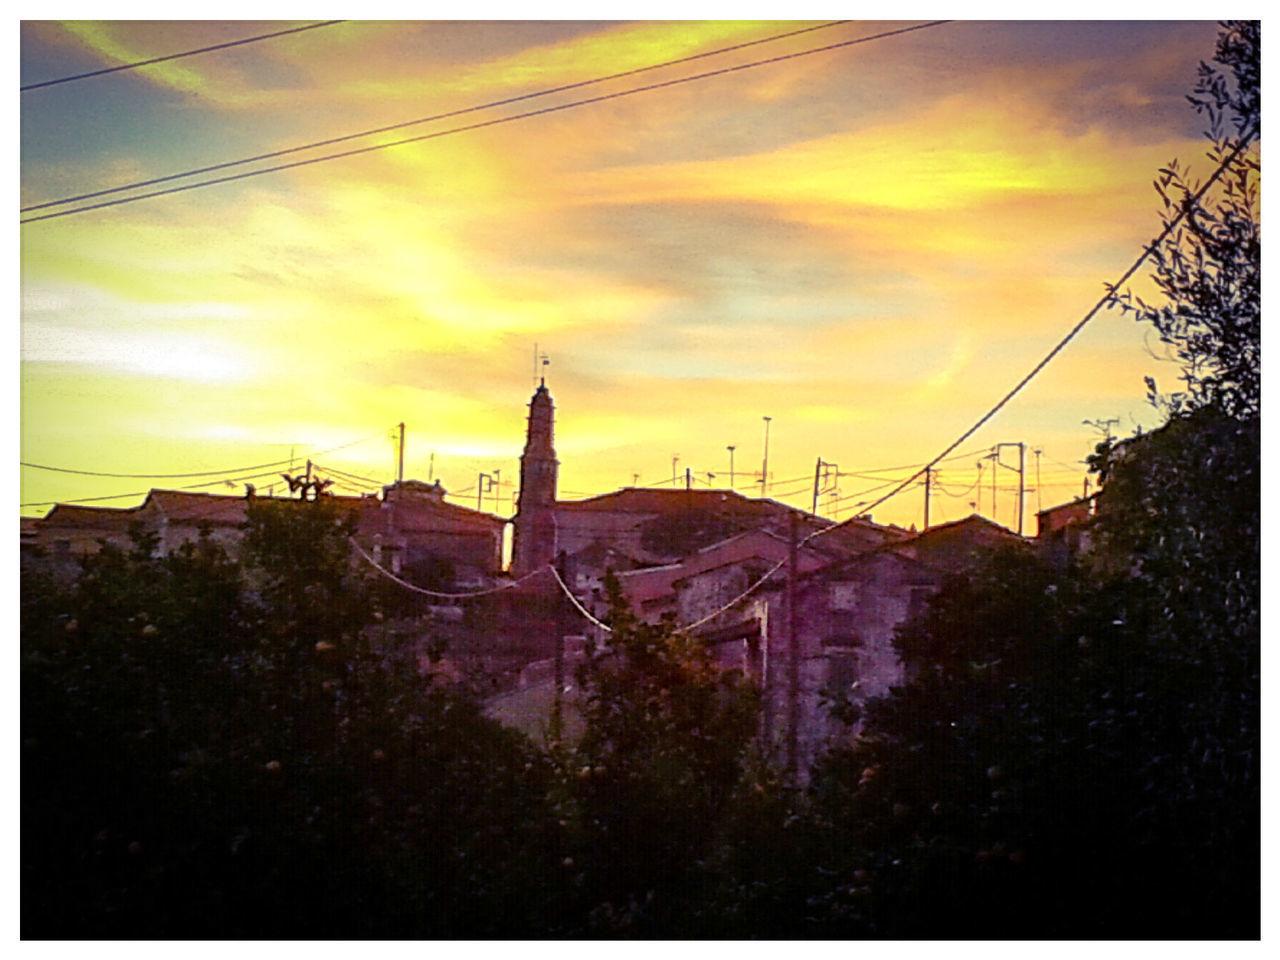 Sunrise Skies Good Morning